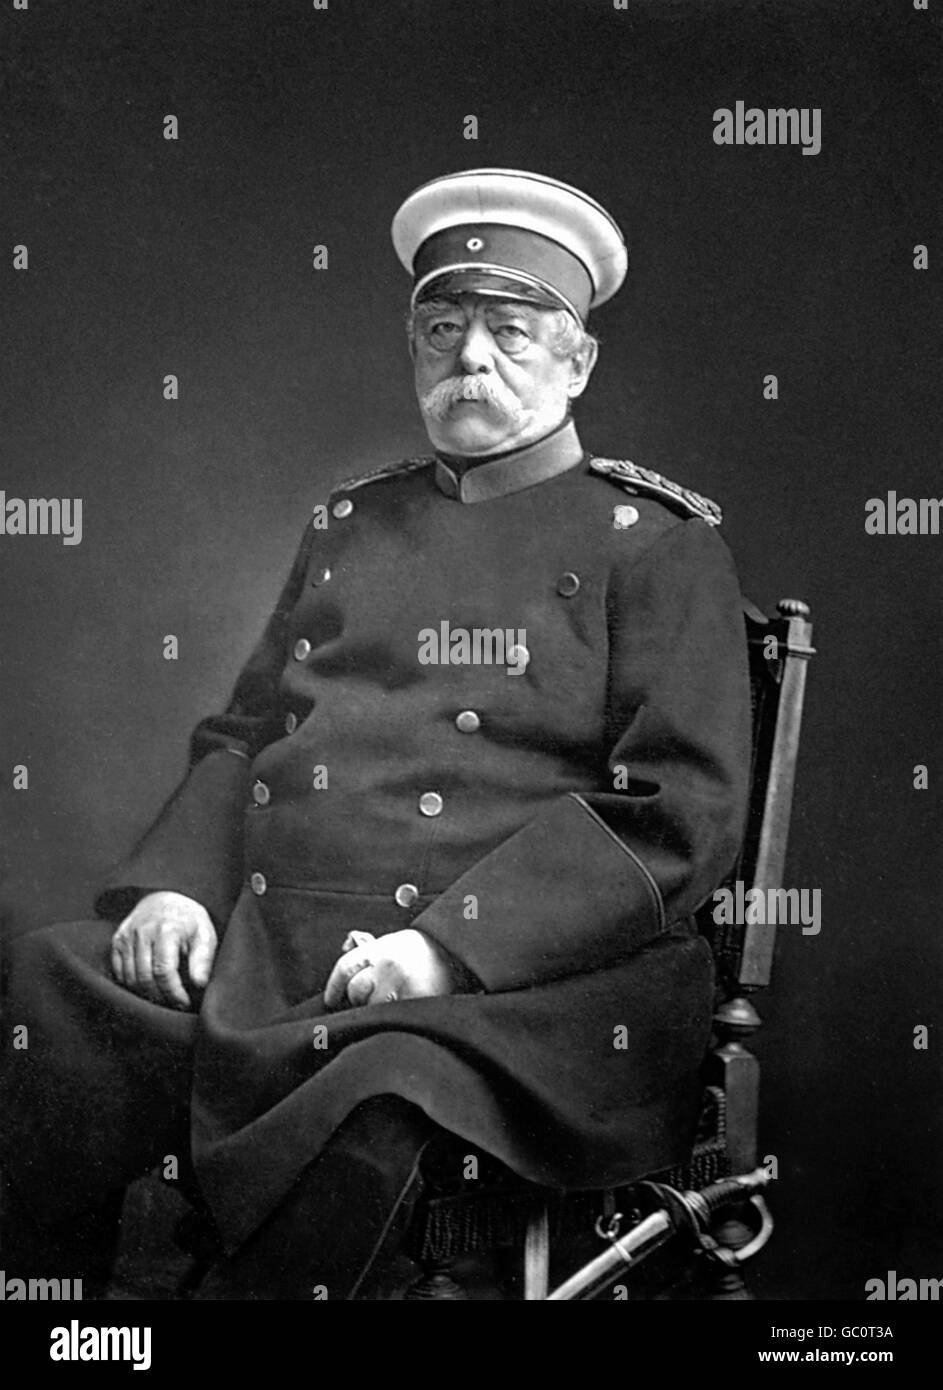 Otto von Bismarck. Portrait of Otto Eduard Leopold, Prince of Bismarck, Duke of Lauenburg (1815-1898), the renowned - Stock Image